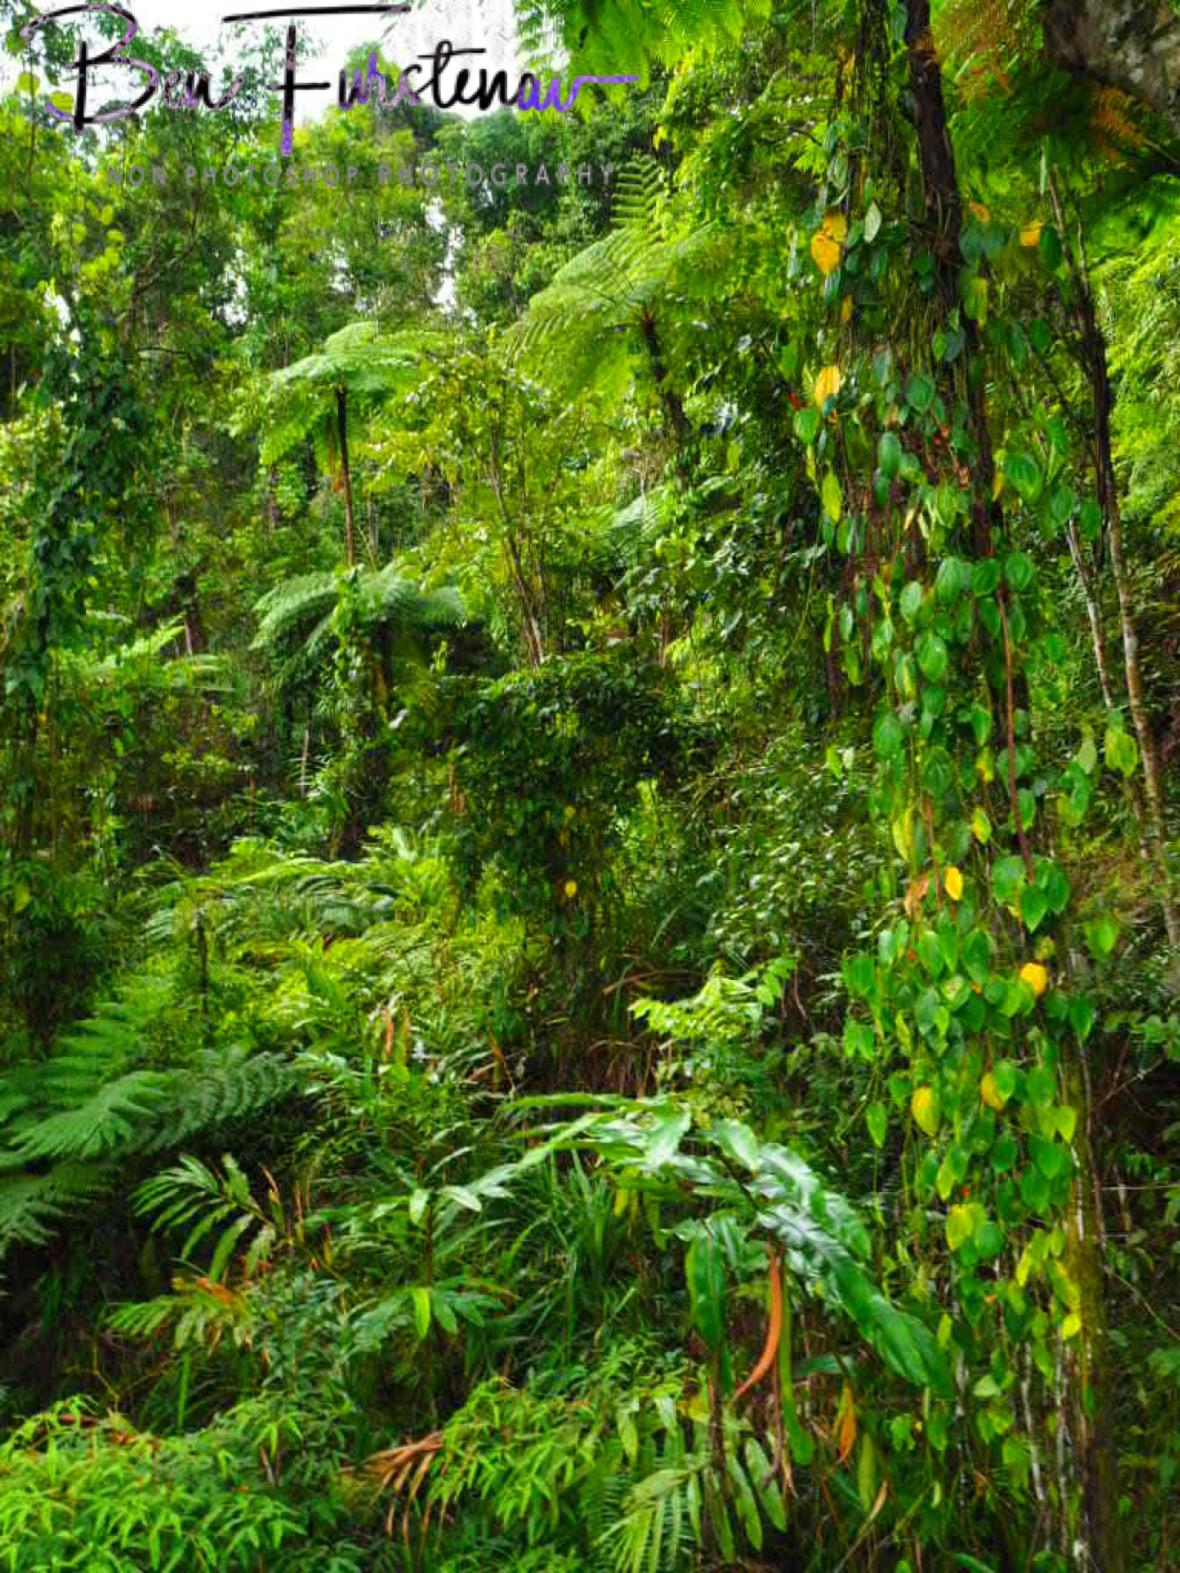 50 shades of green at Babinda, Tropical Northern Queensland, Australia